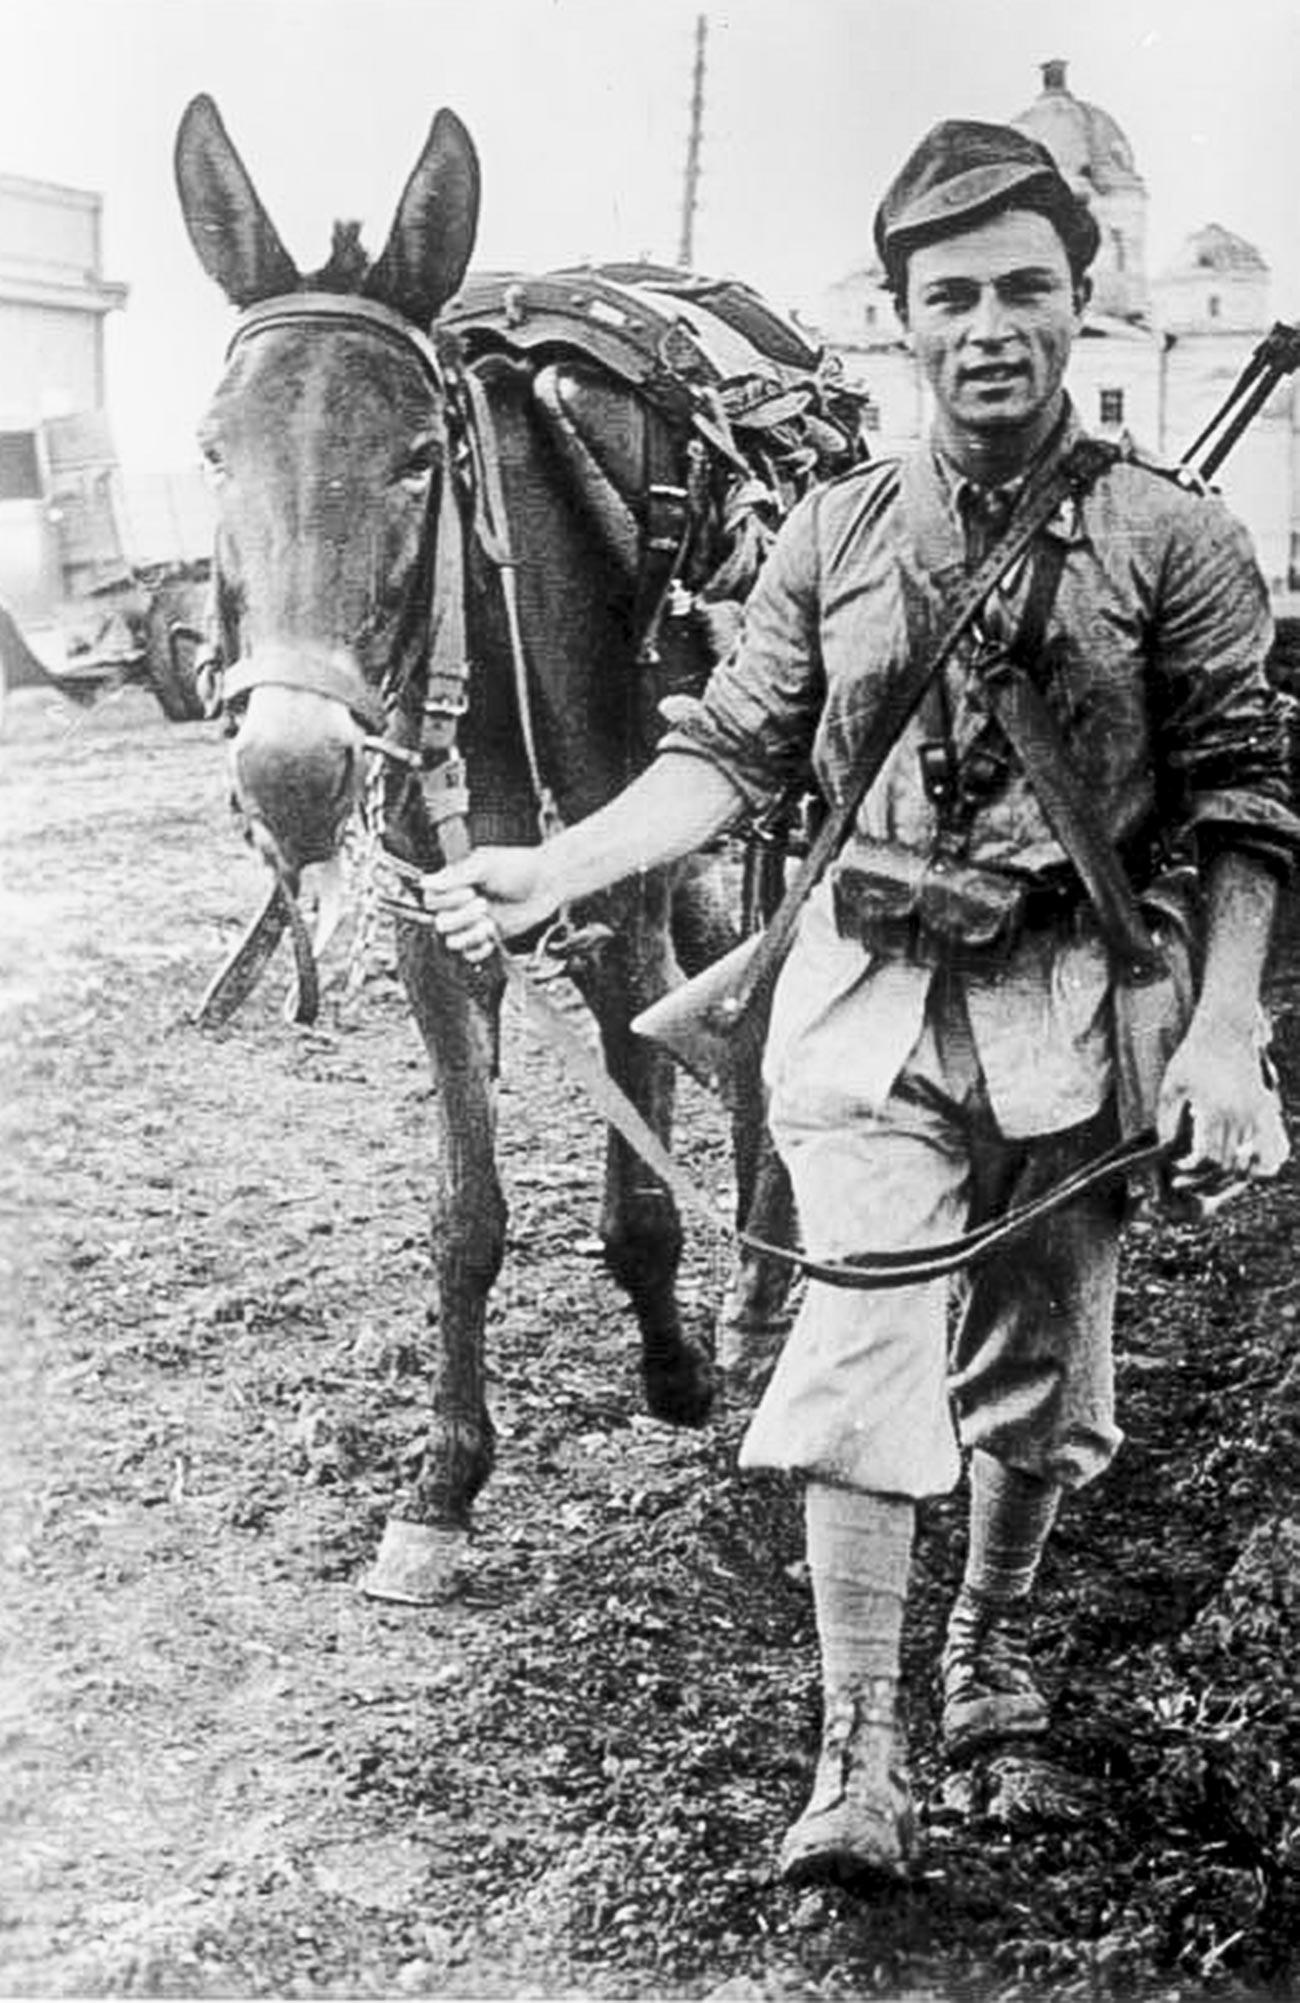 Talijanski vojnik kod Harkova, Rusija.